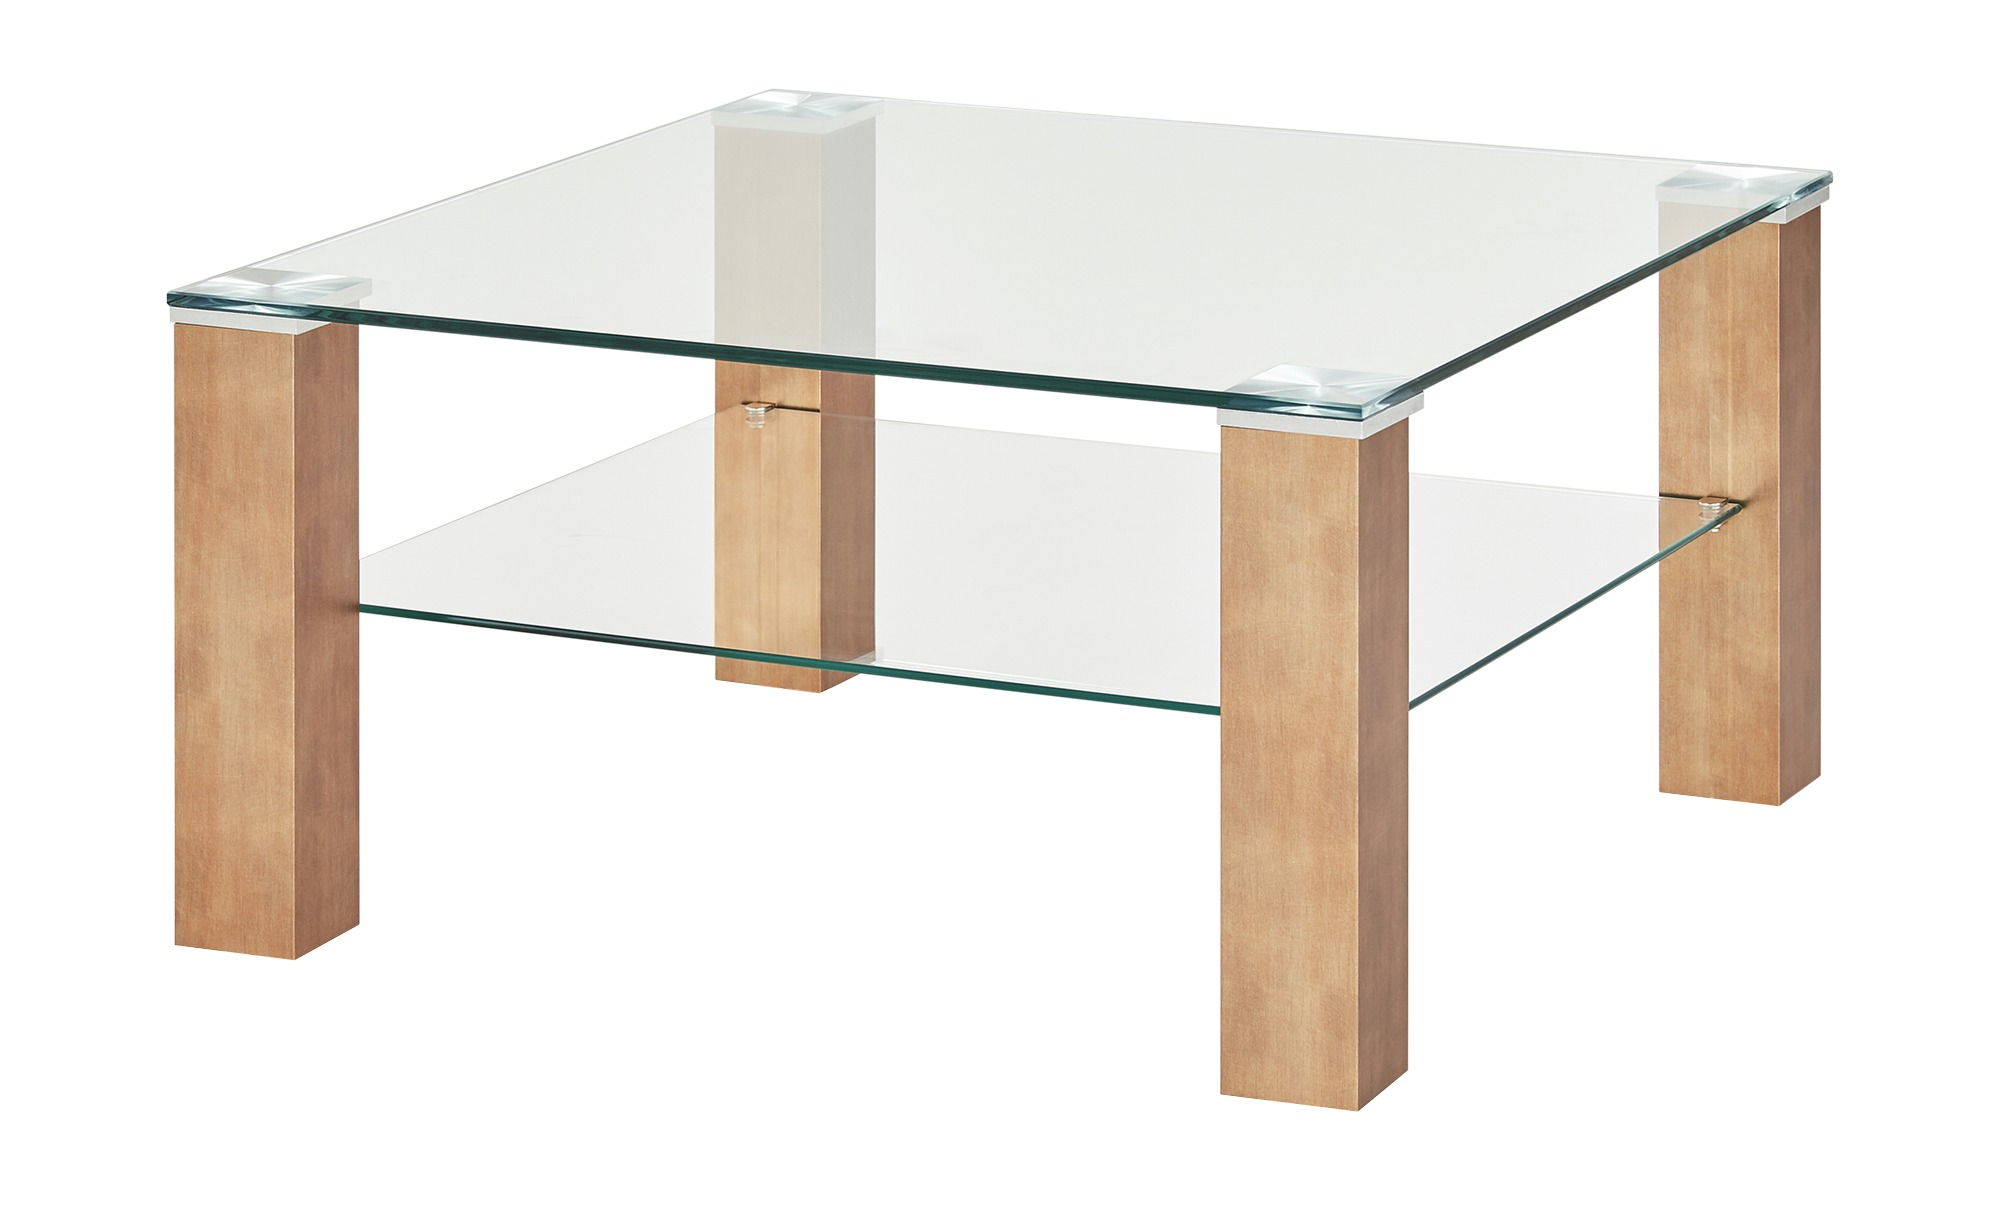 Couchtisch  Ancona ¦ transparent/klar ¦ Maße (cm): B: 75 H: 40 T: 75 Tische > Couchtische > Couchtische rechteckig - Höffner